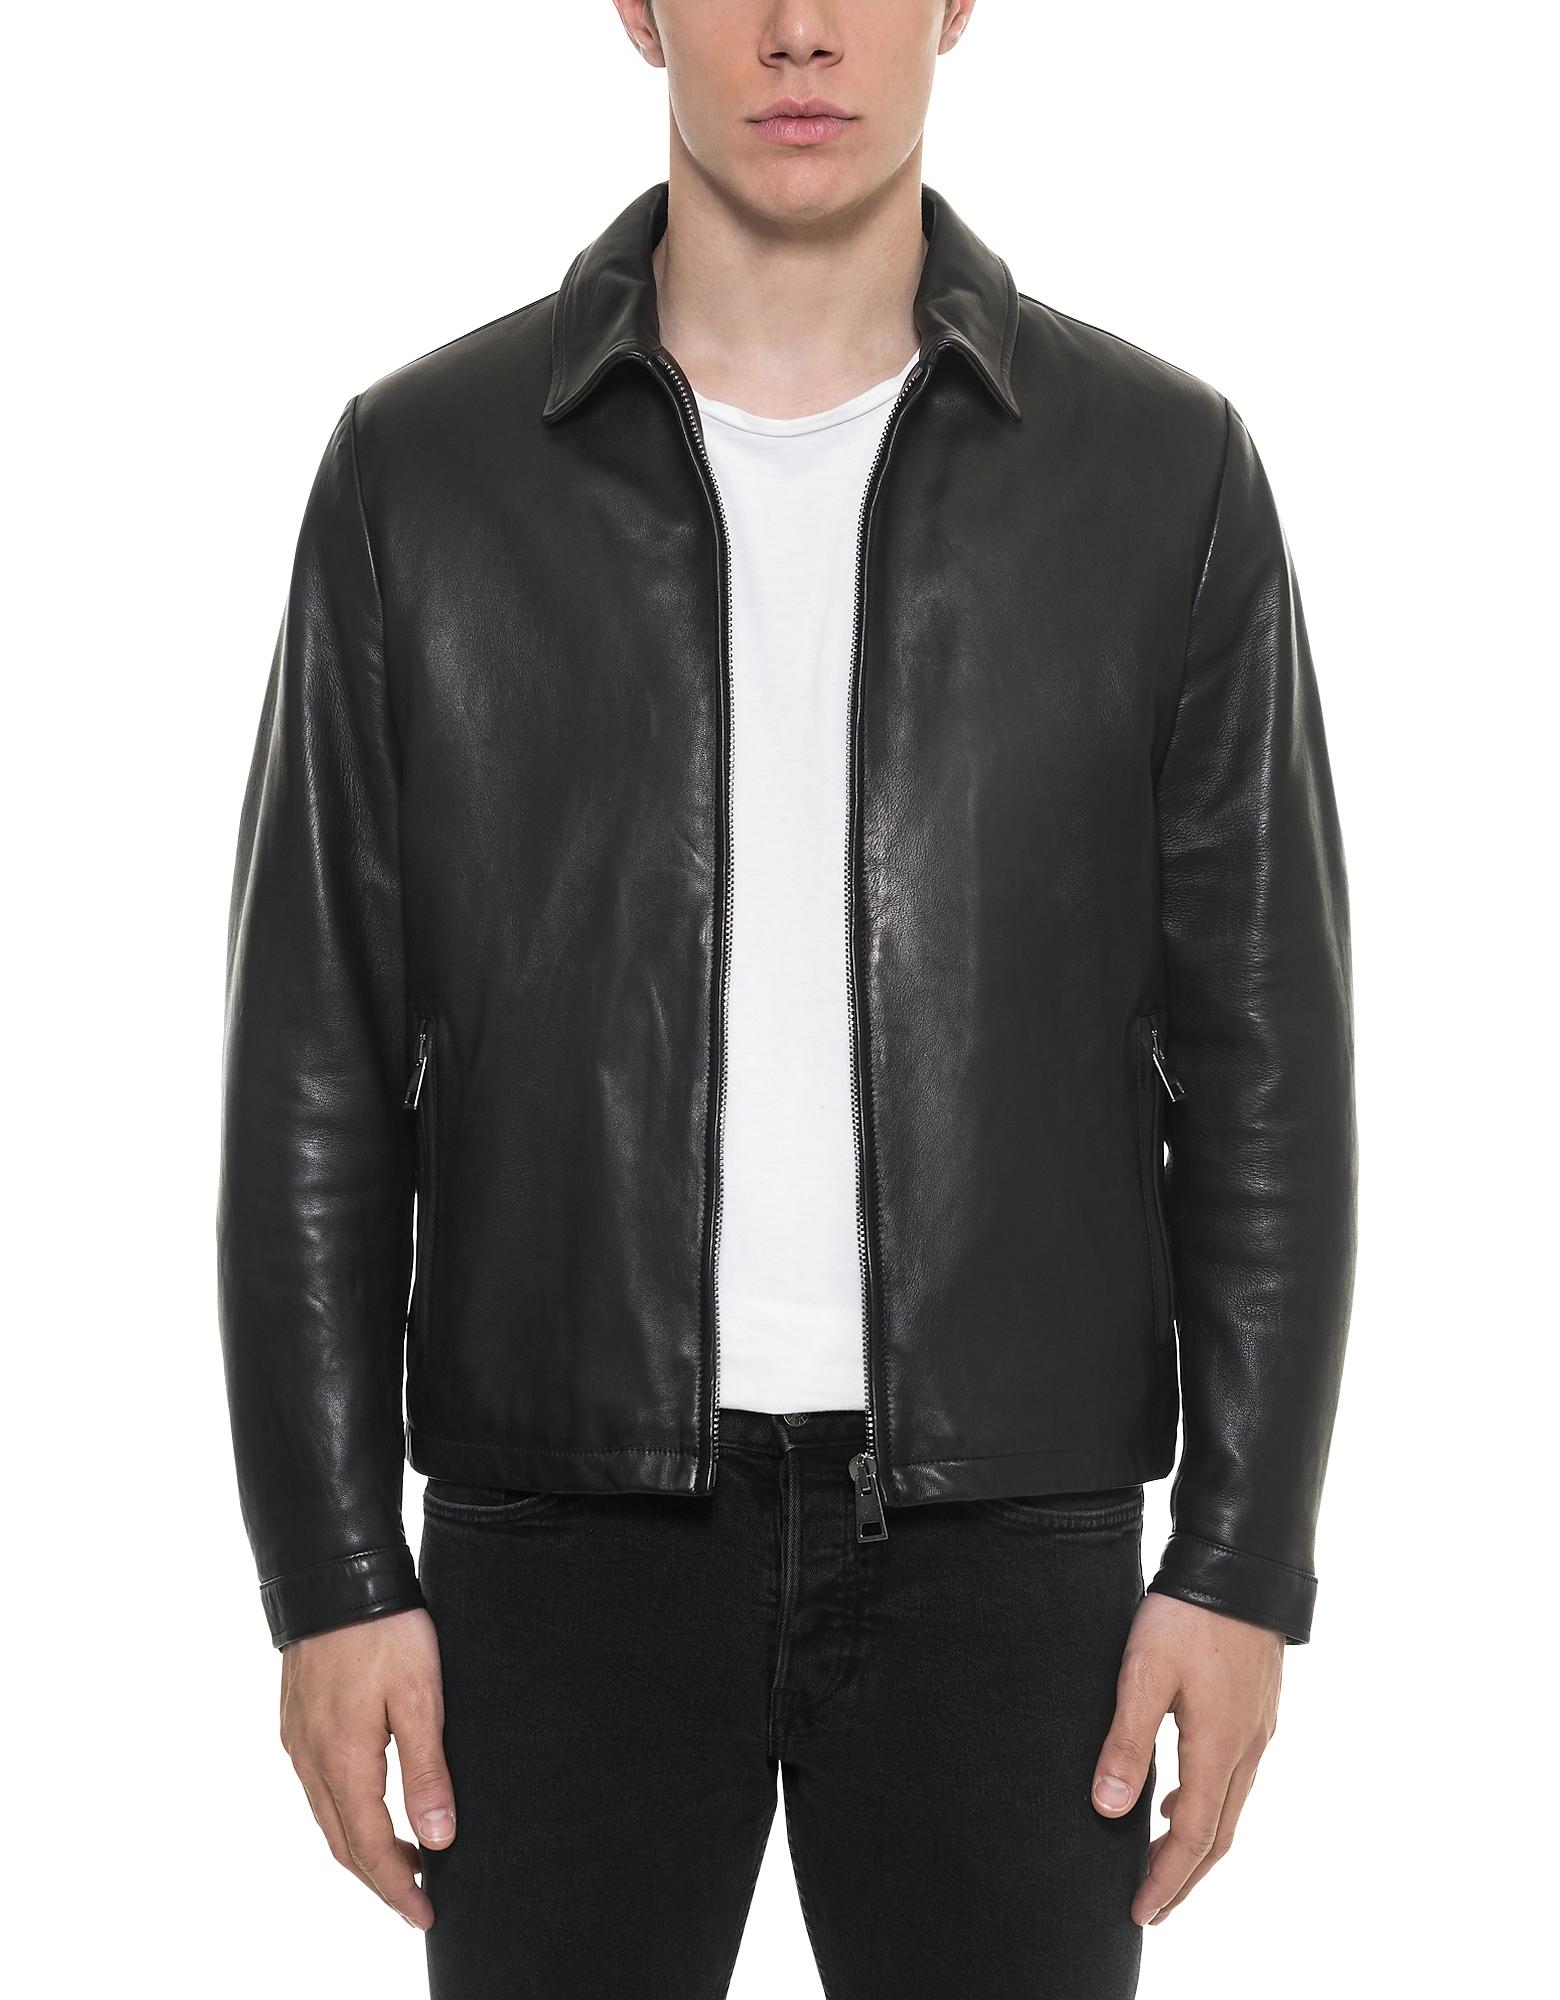 Forzieri Leather Jackets, Black Padded Leather Men's Zippered Jacket